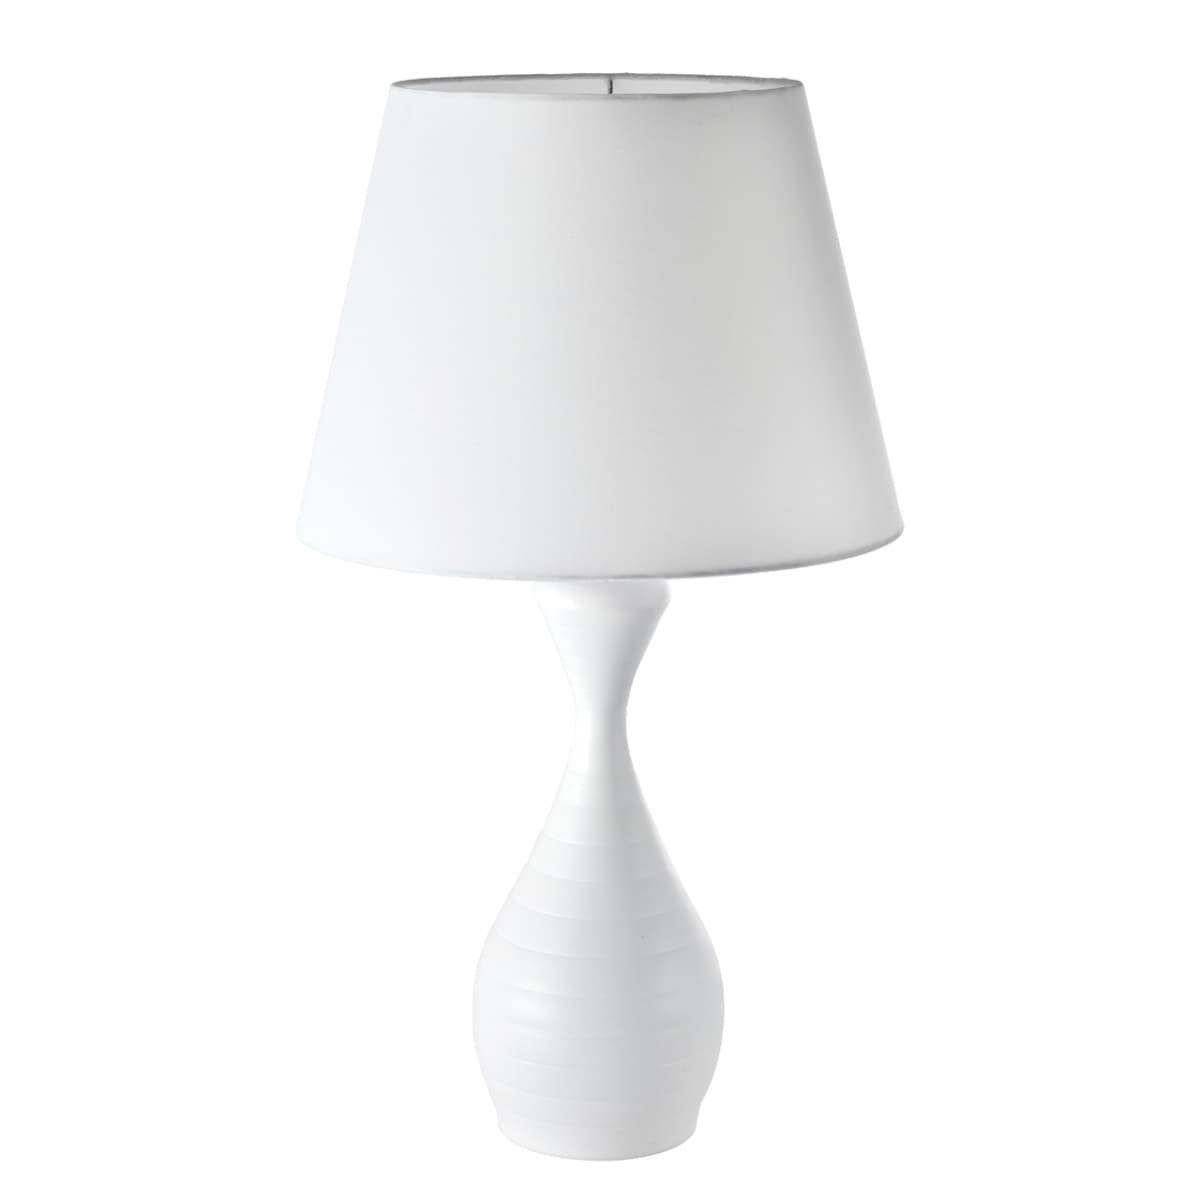 Veoiza MW-Light Elegance Salon 415033901 poza